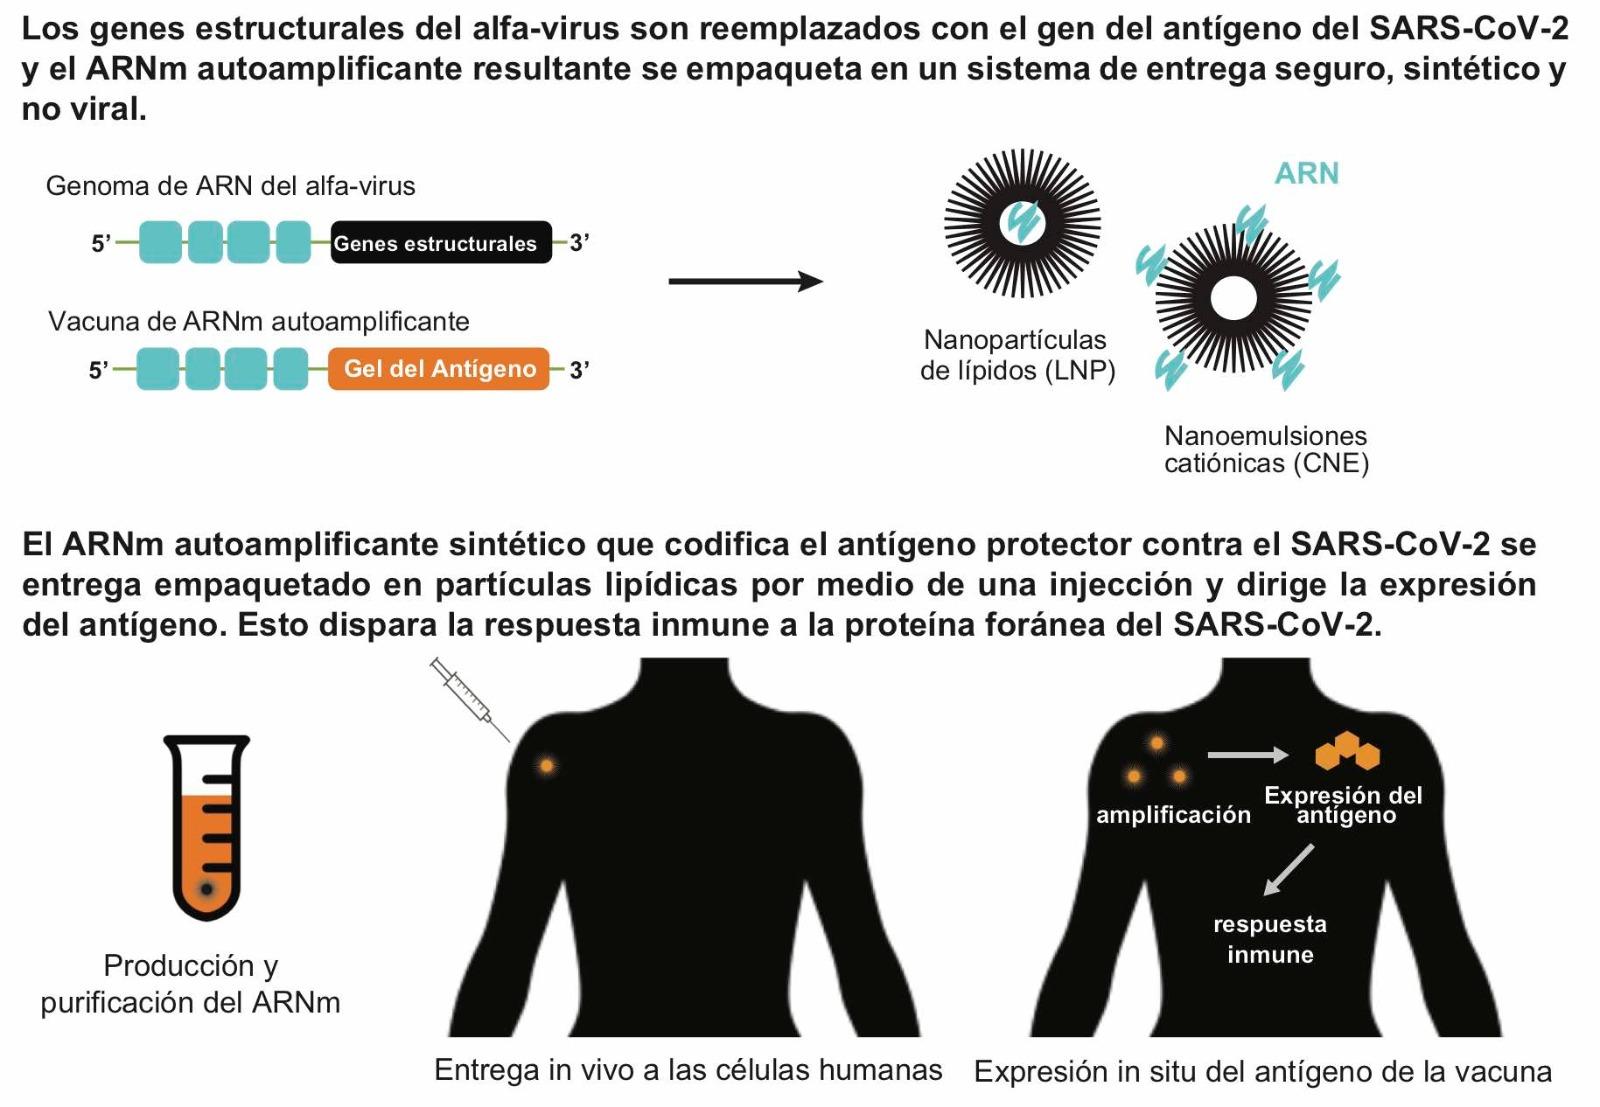 Vacunas de ARNm autoamplificadoras administradas con sistemas no virales